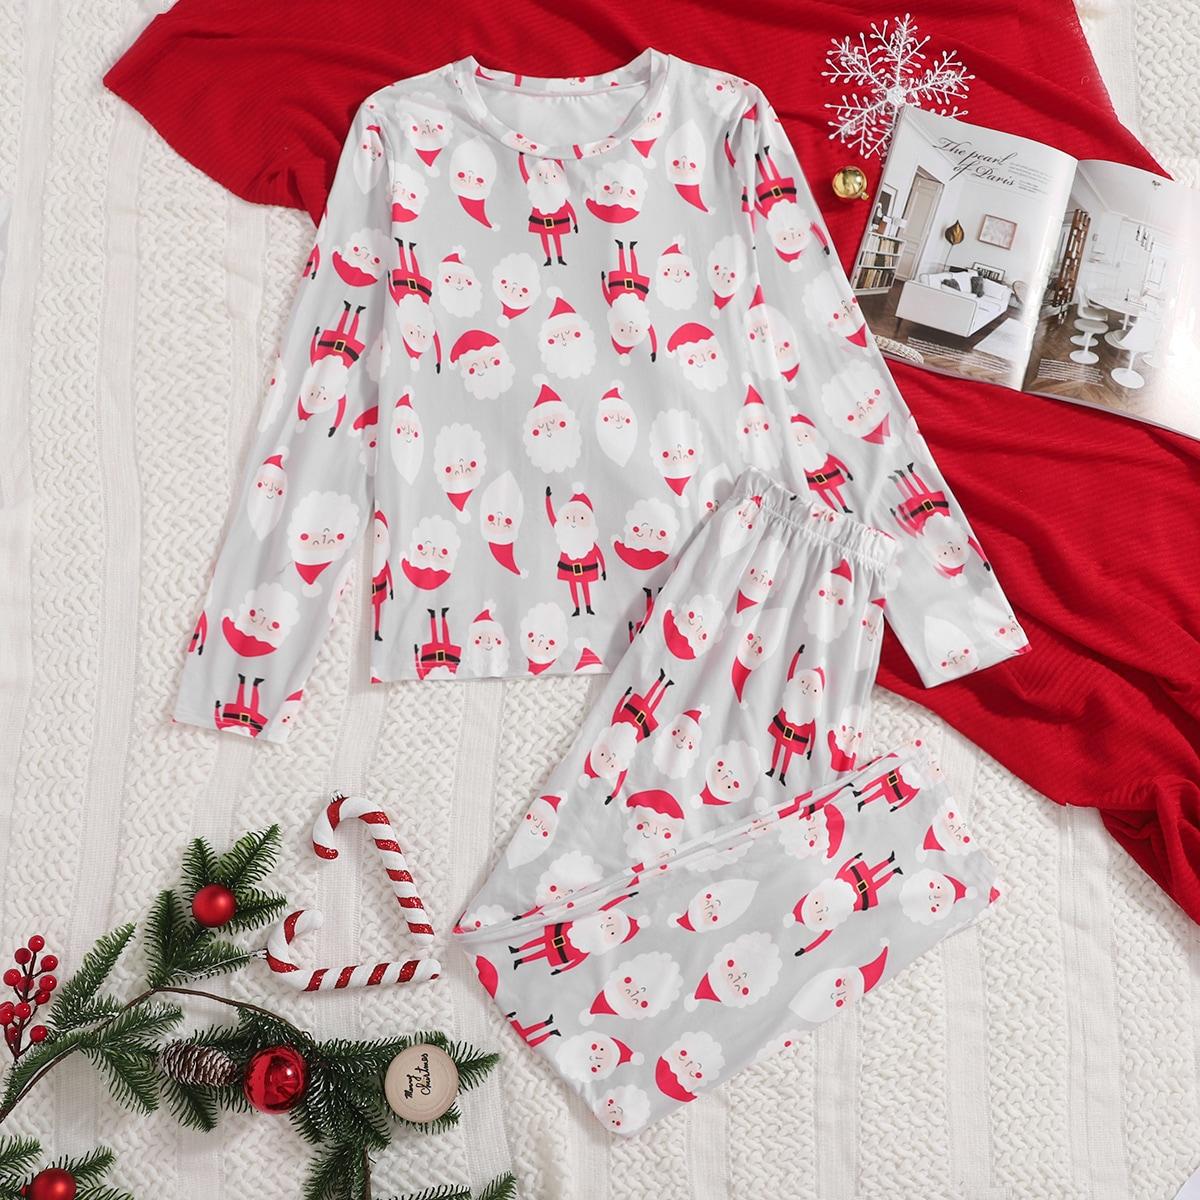 Christmas Print Top And Tartan Pants PJ Set